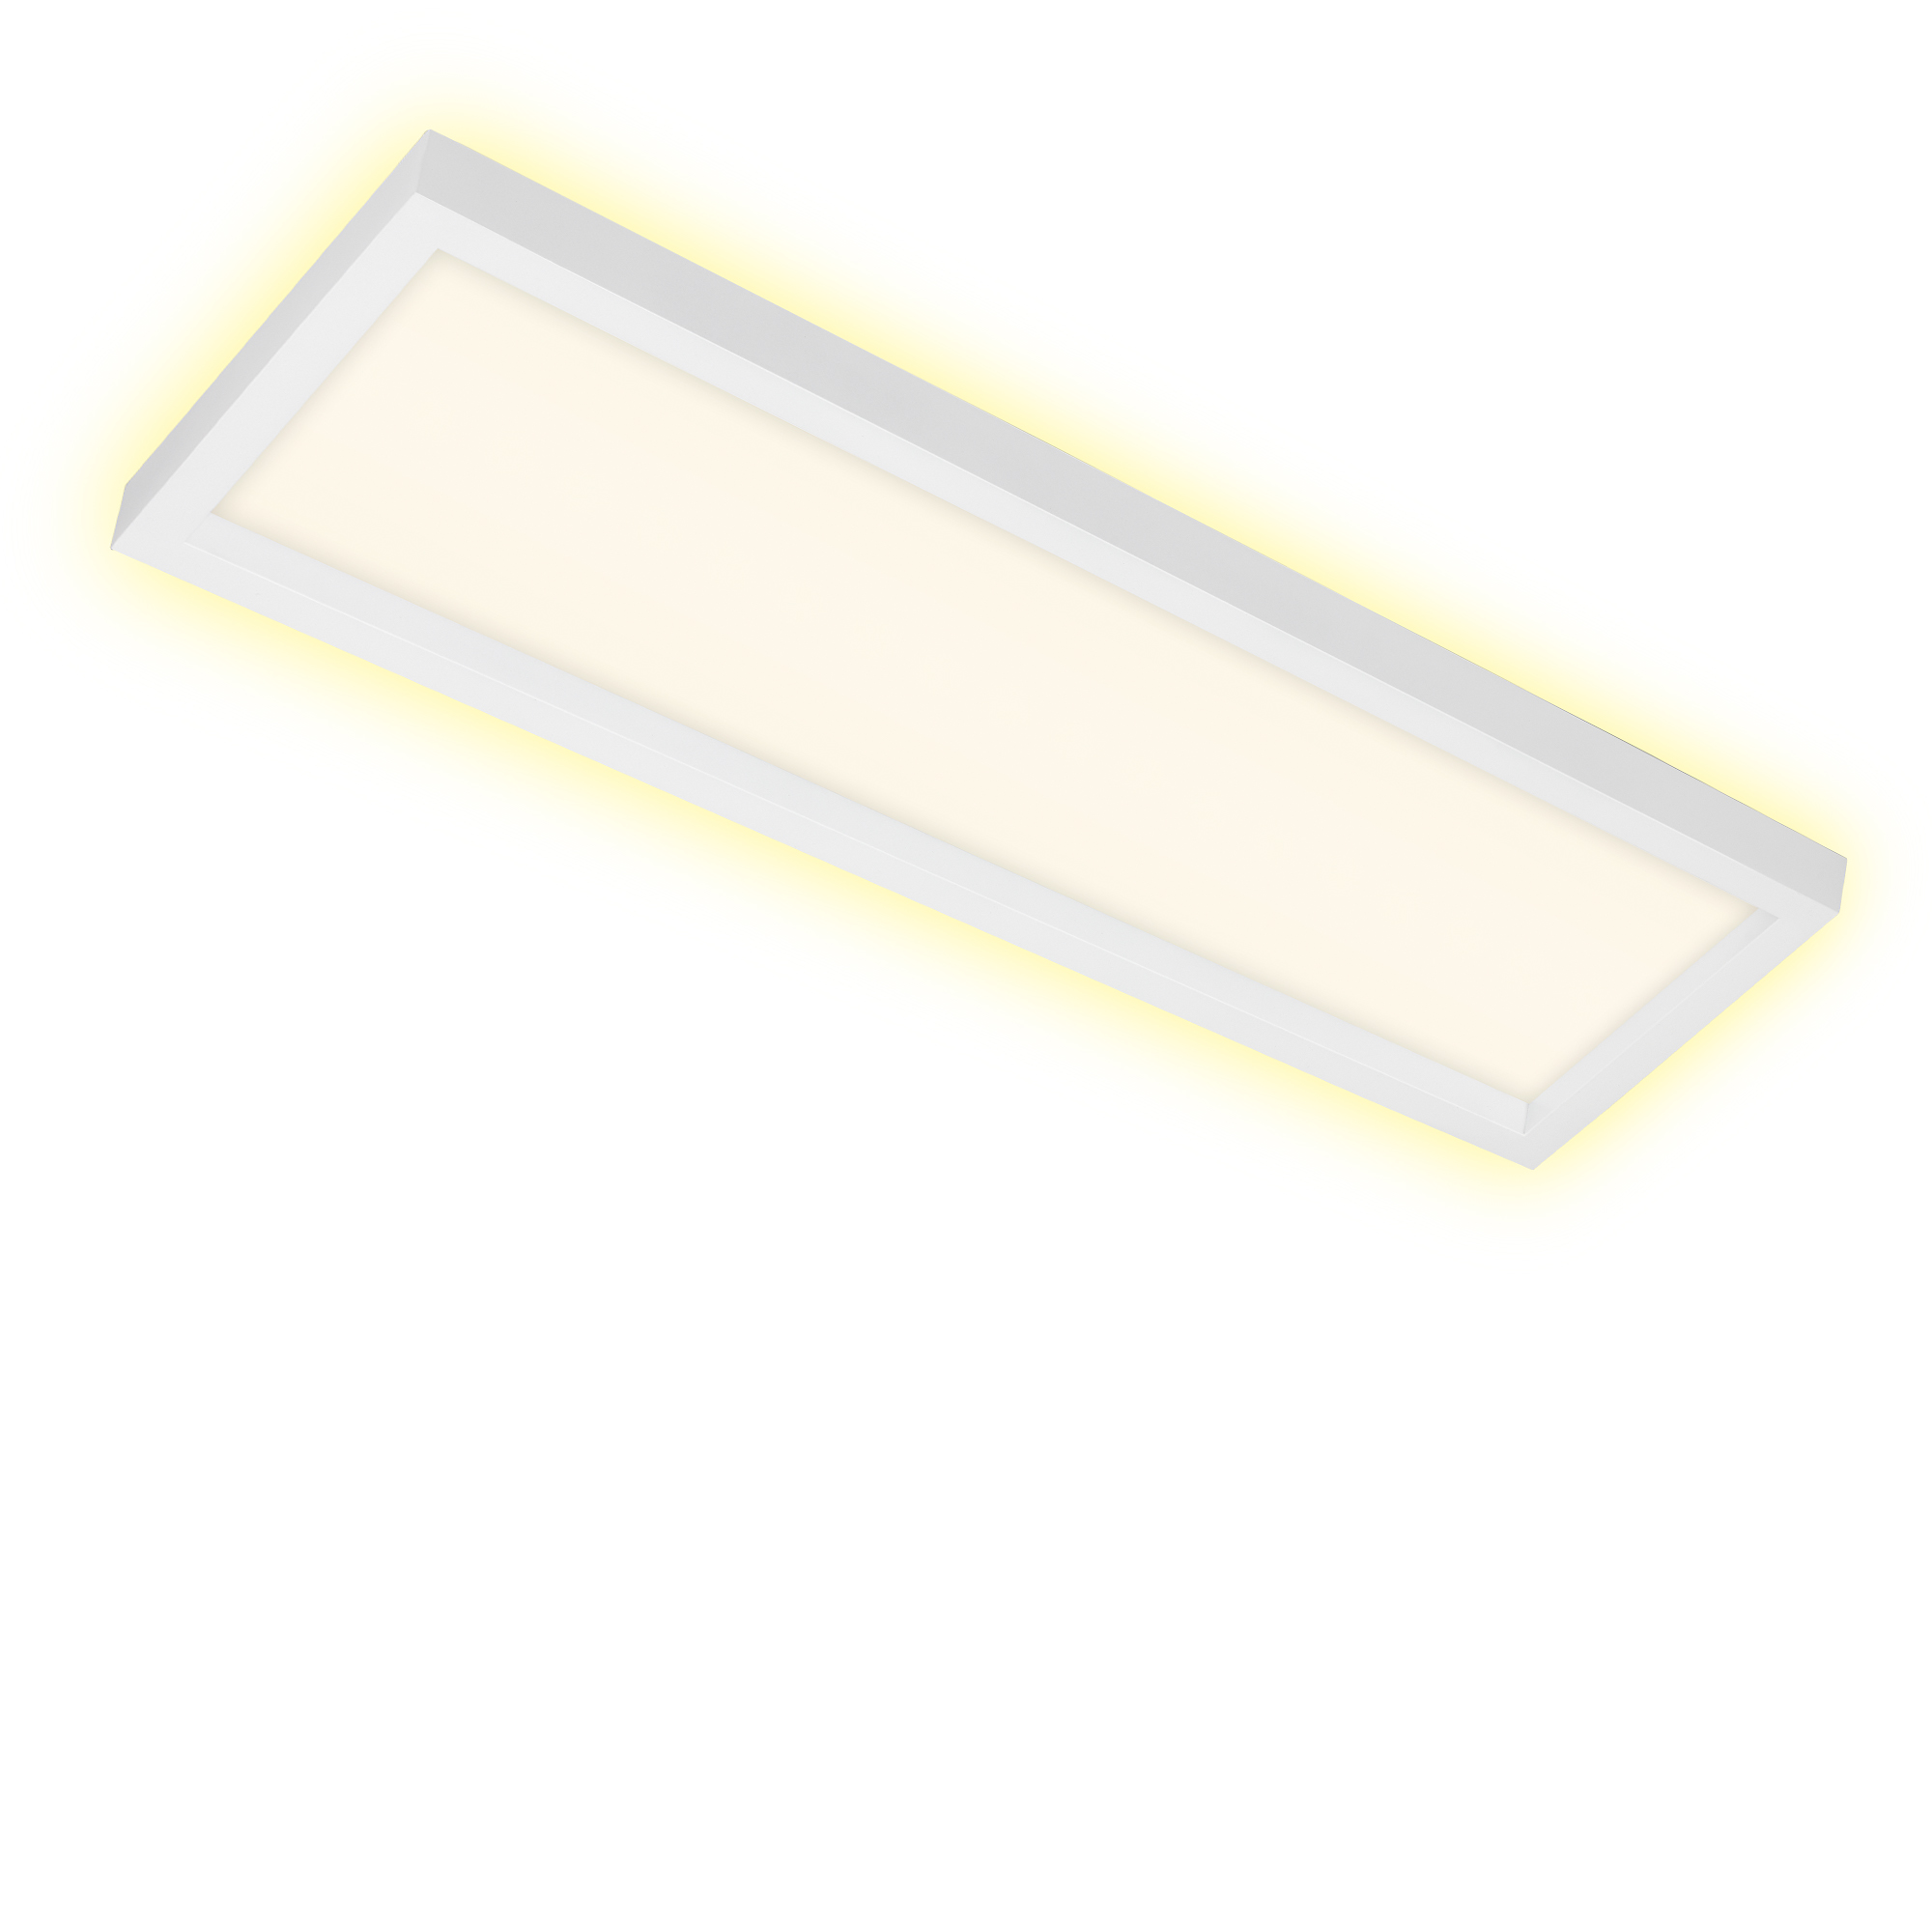 LED Panel, 58,2 cm, 3000 LUMEN, 22 WATT, Weiss